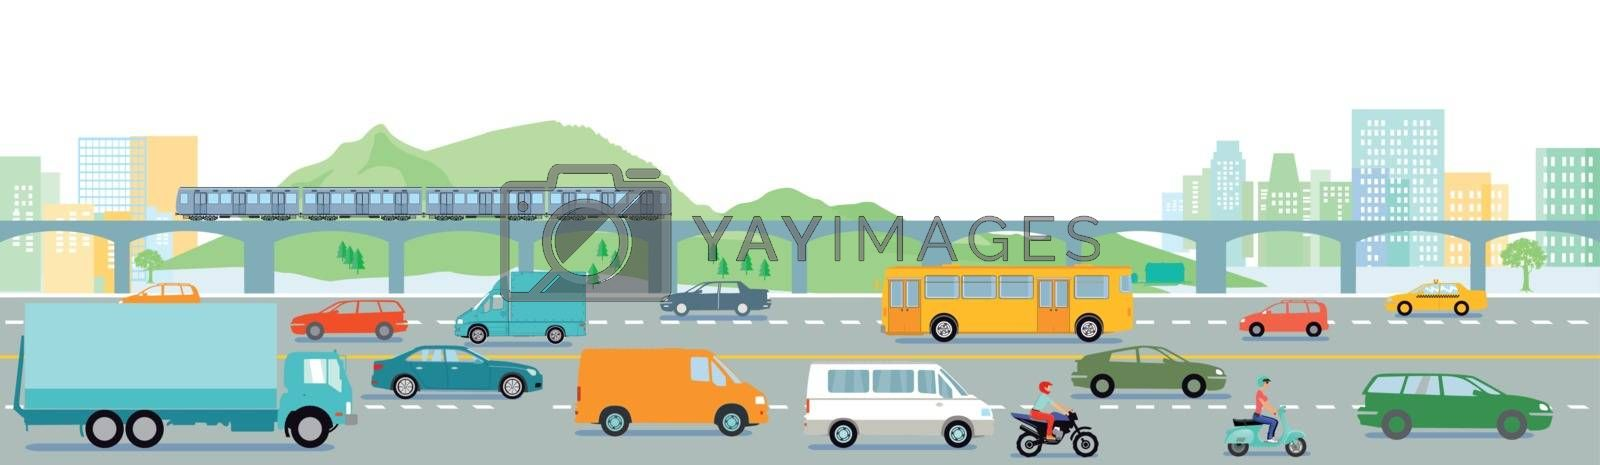 Highway with big city illustration